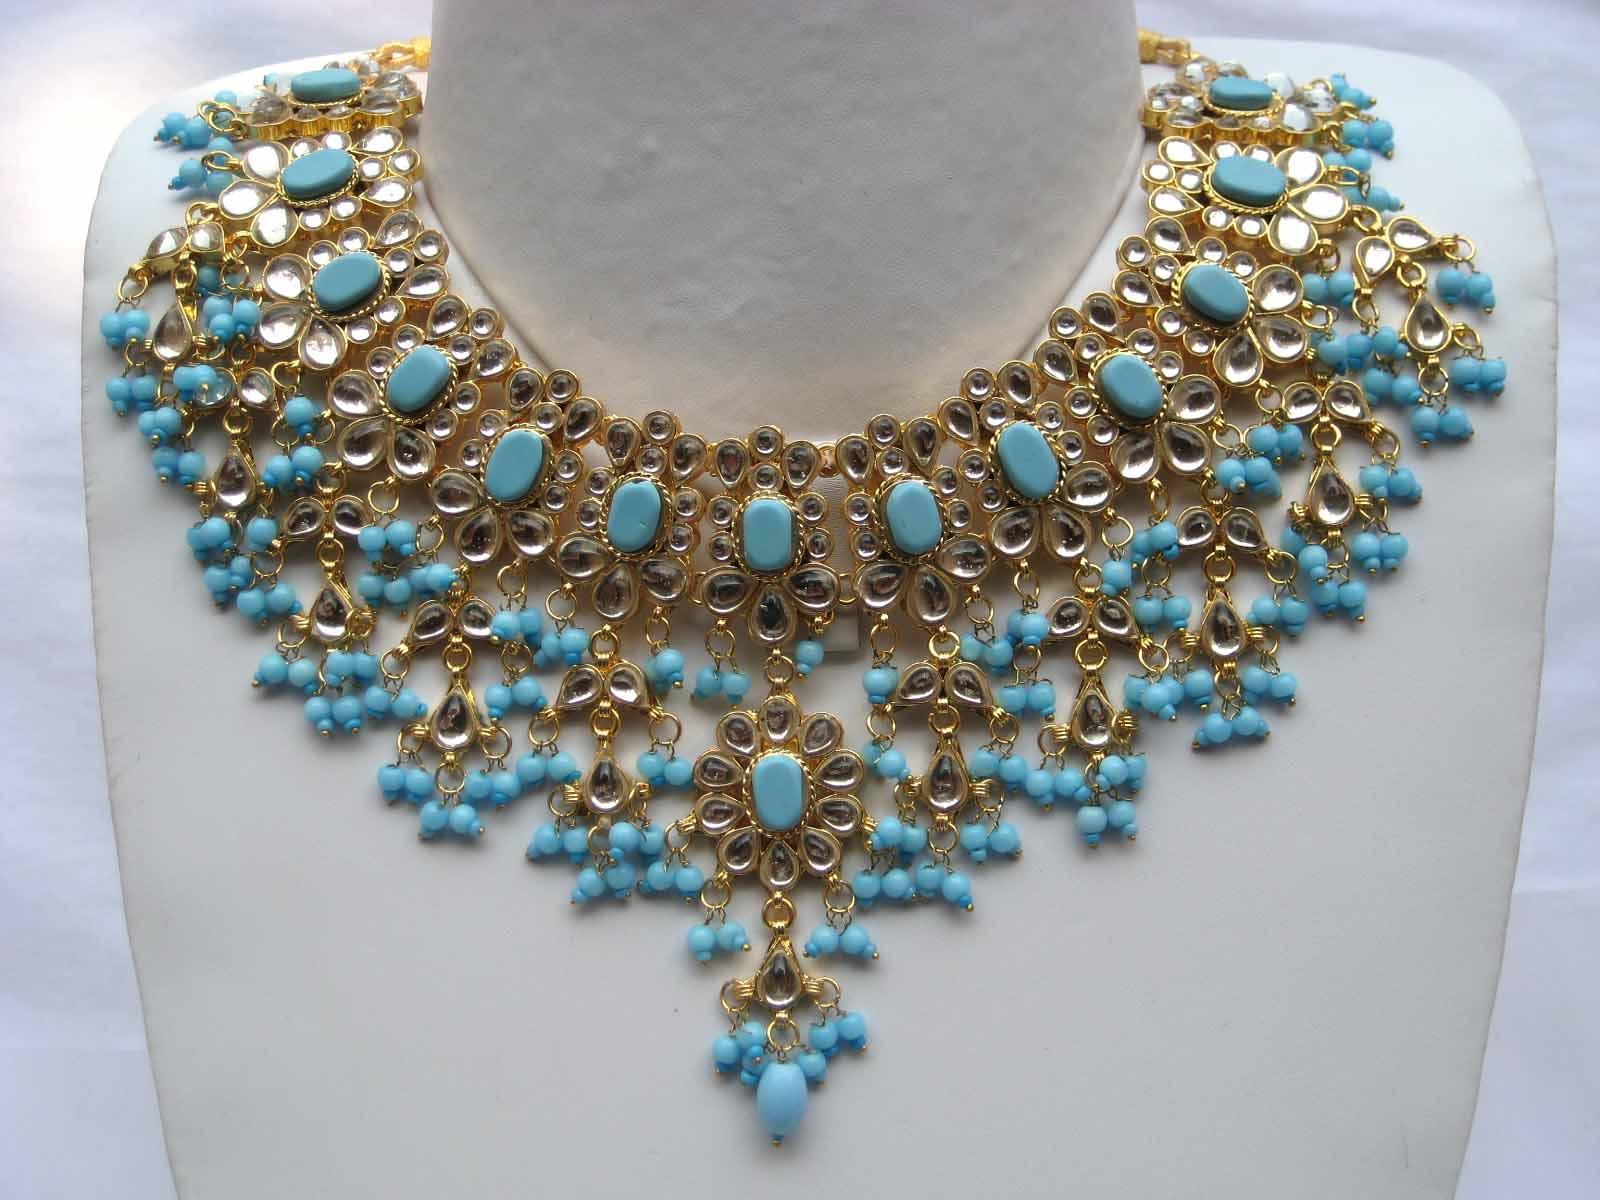 jewellery stores, jewellery online, jewellery fashion, indian jewellery designs, indian jewellery, jewellery definition, jewellery making, jewellery exchange-116